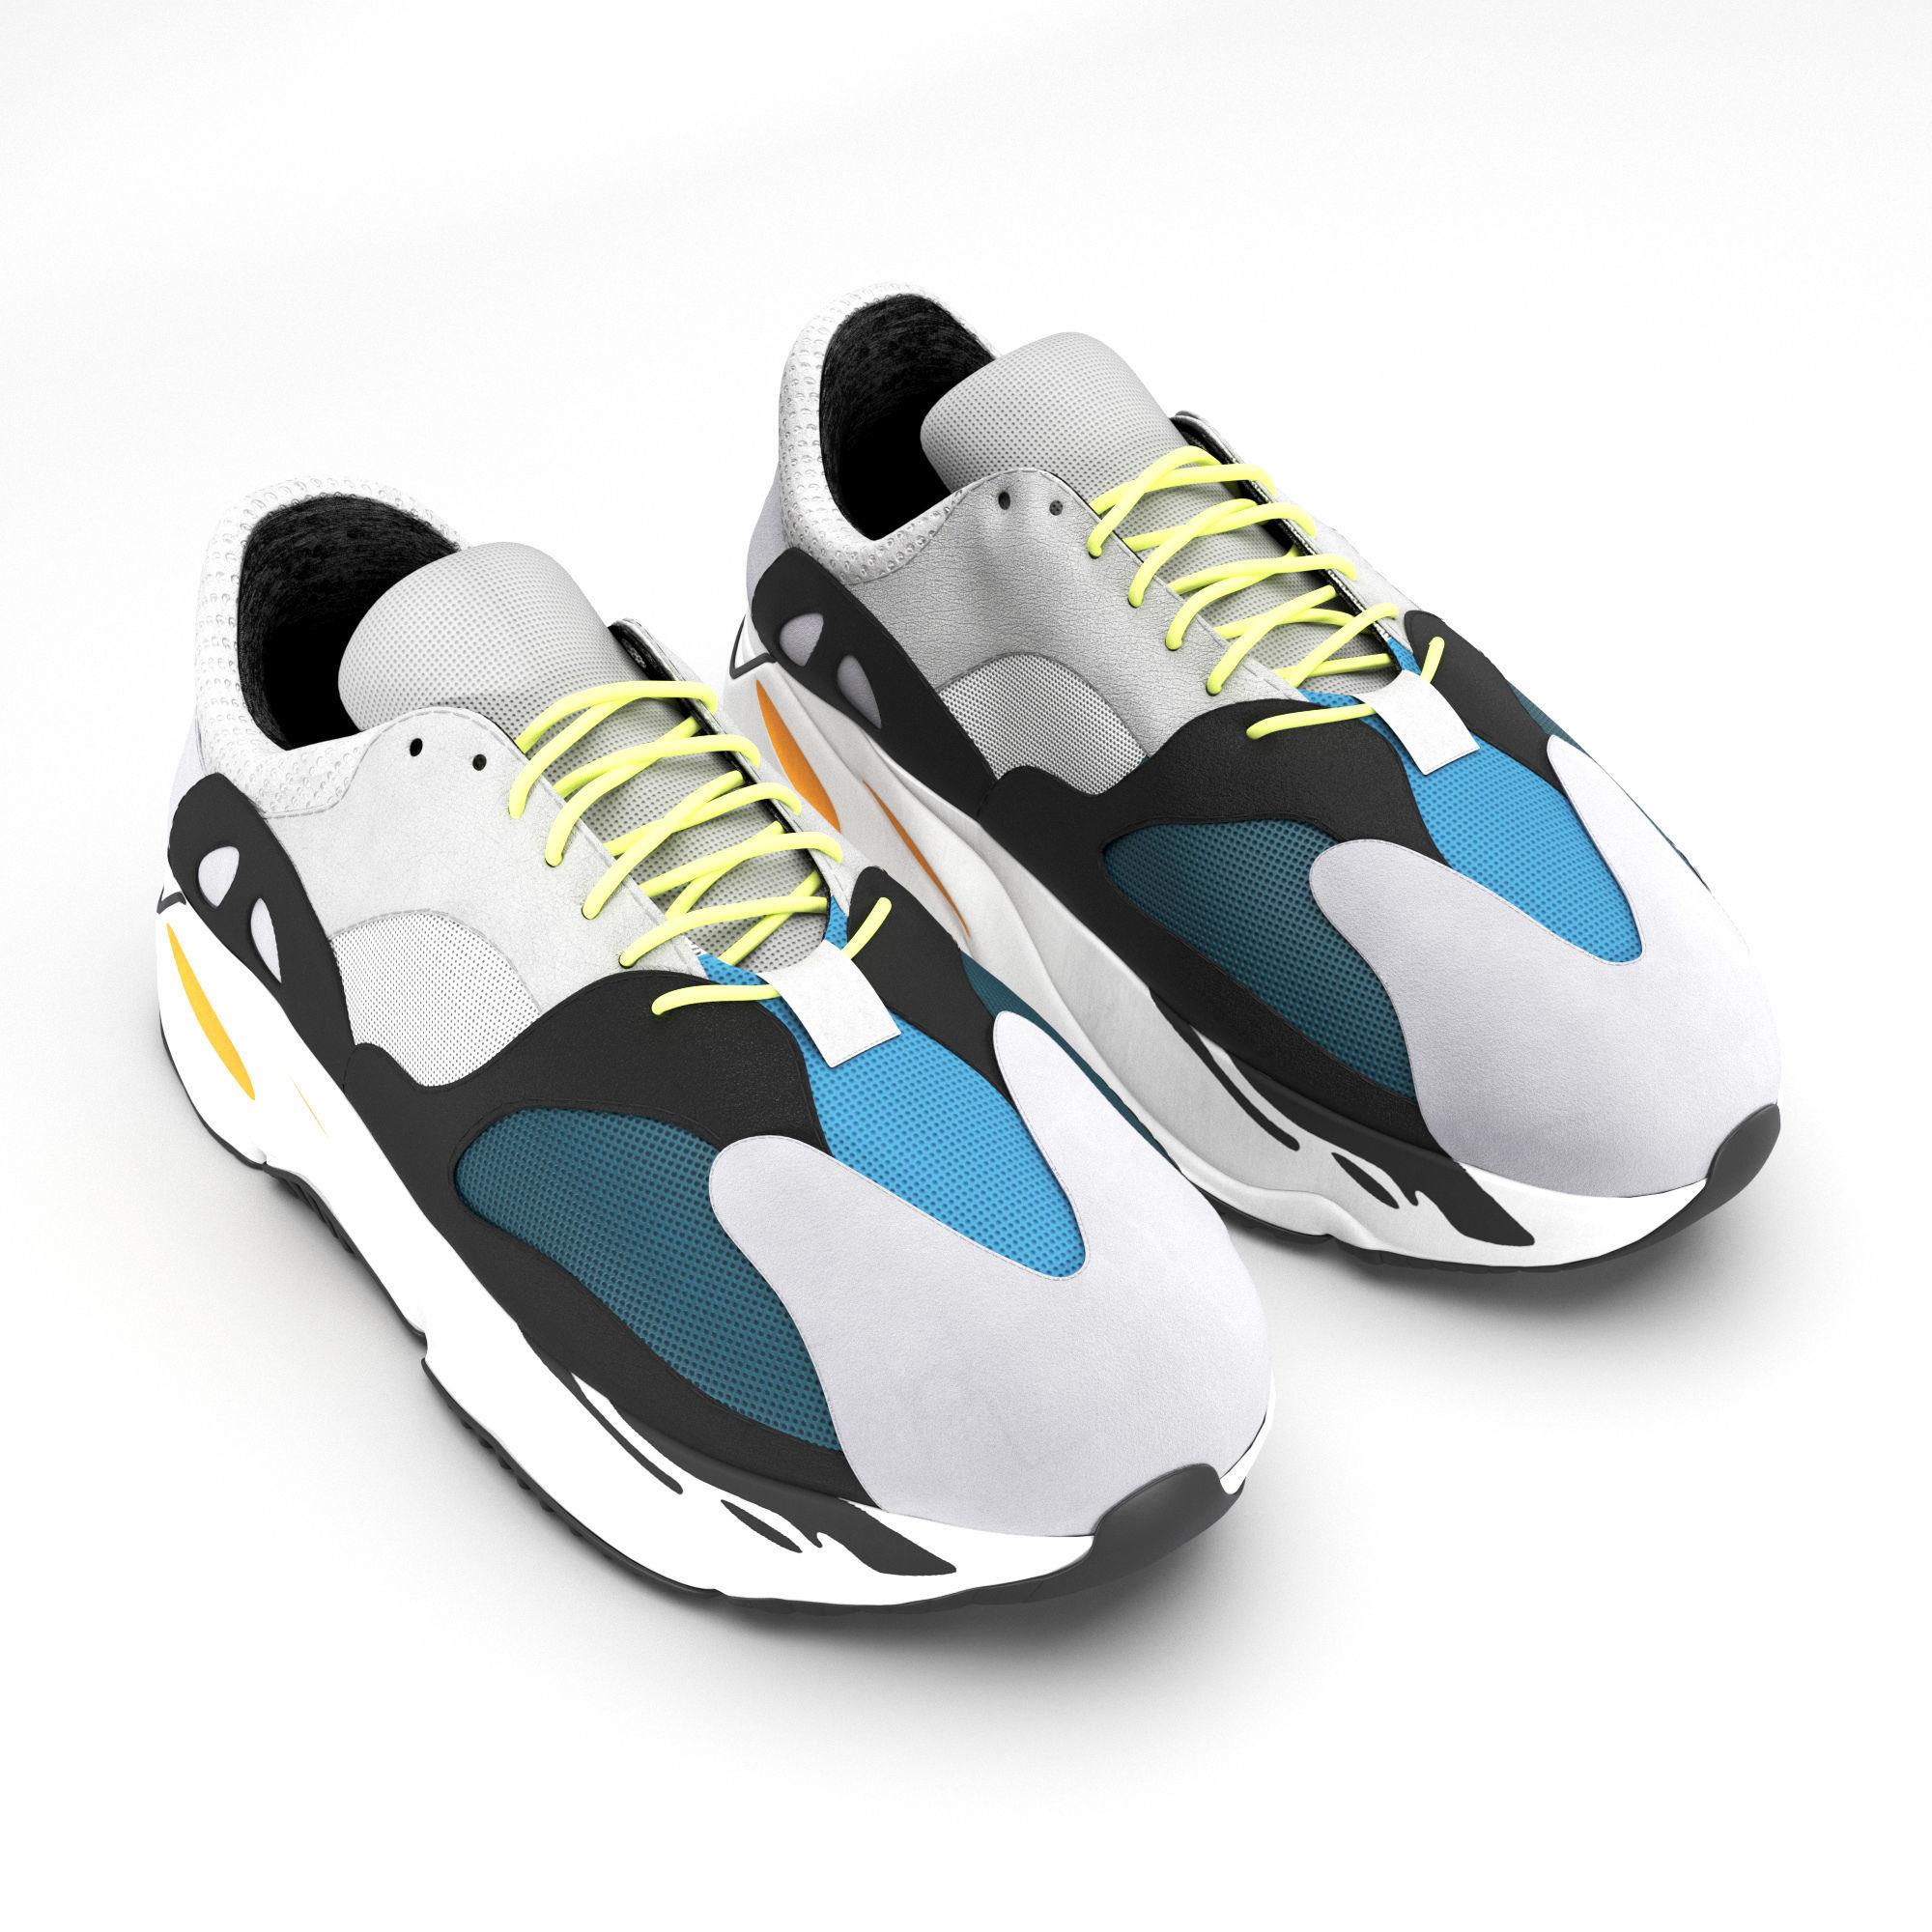 95f46072426b ... 4  adidas yeezy wave 700 3d model max obj mtl fbx mat 5 ...